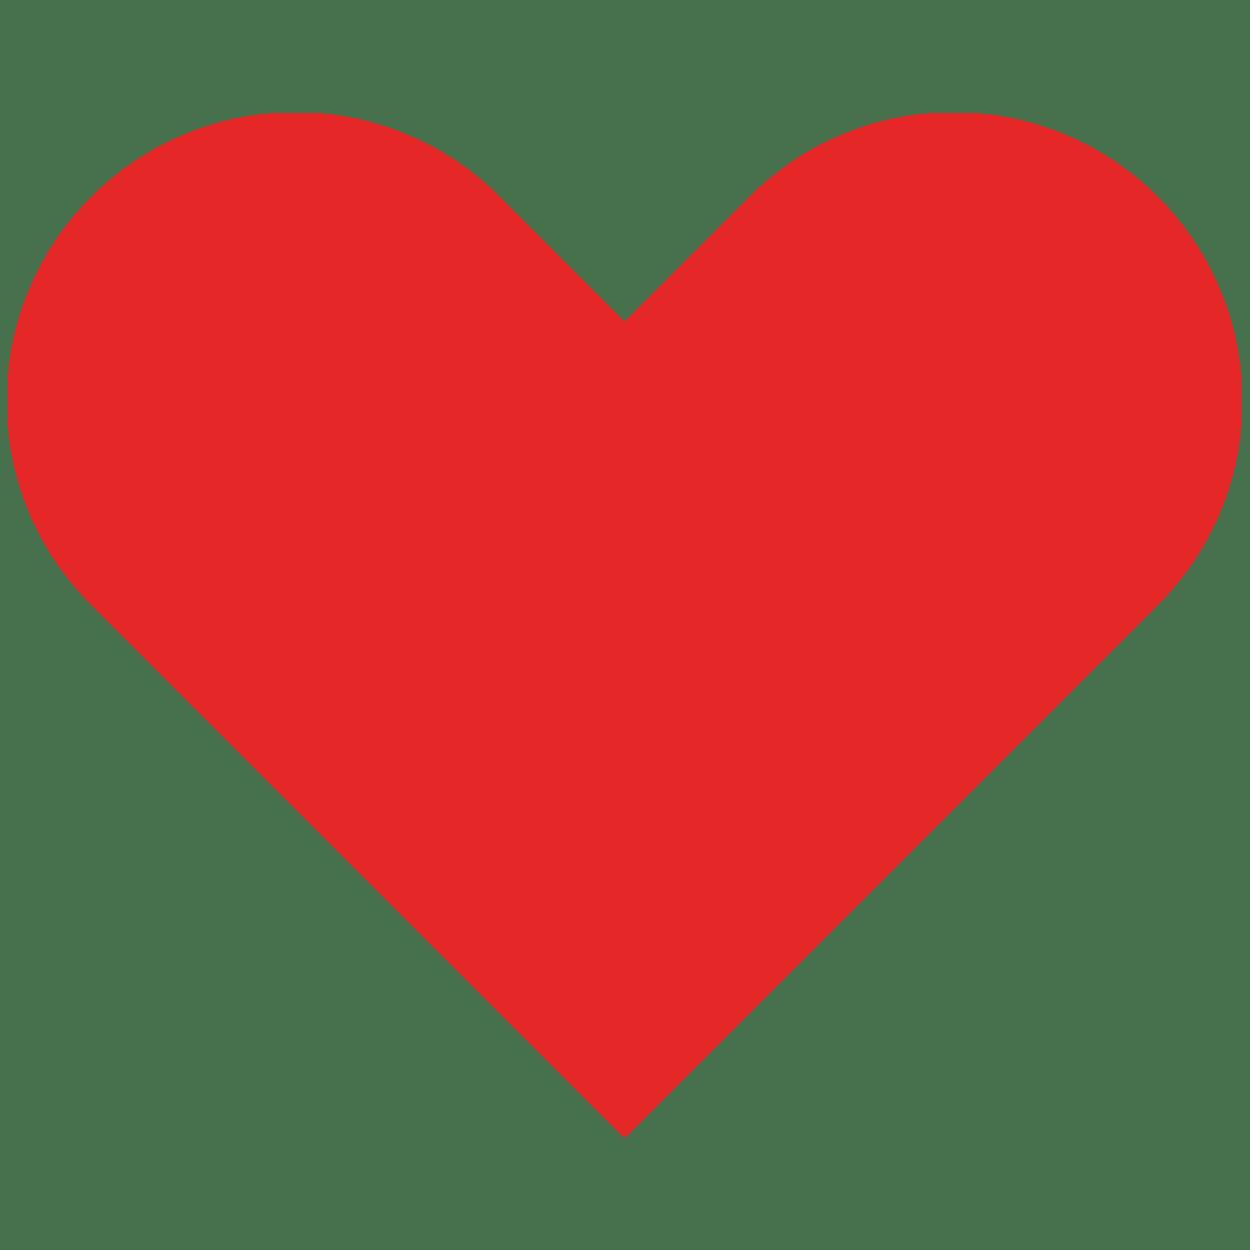 Heart Transparent Image